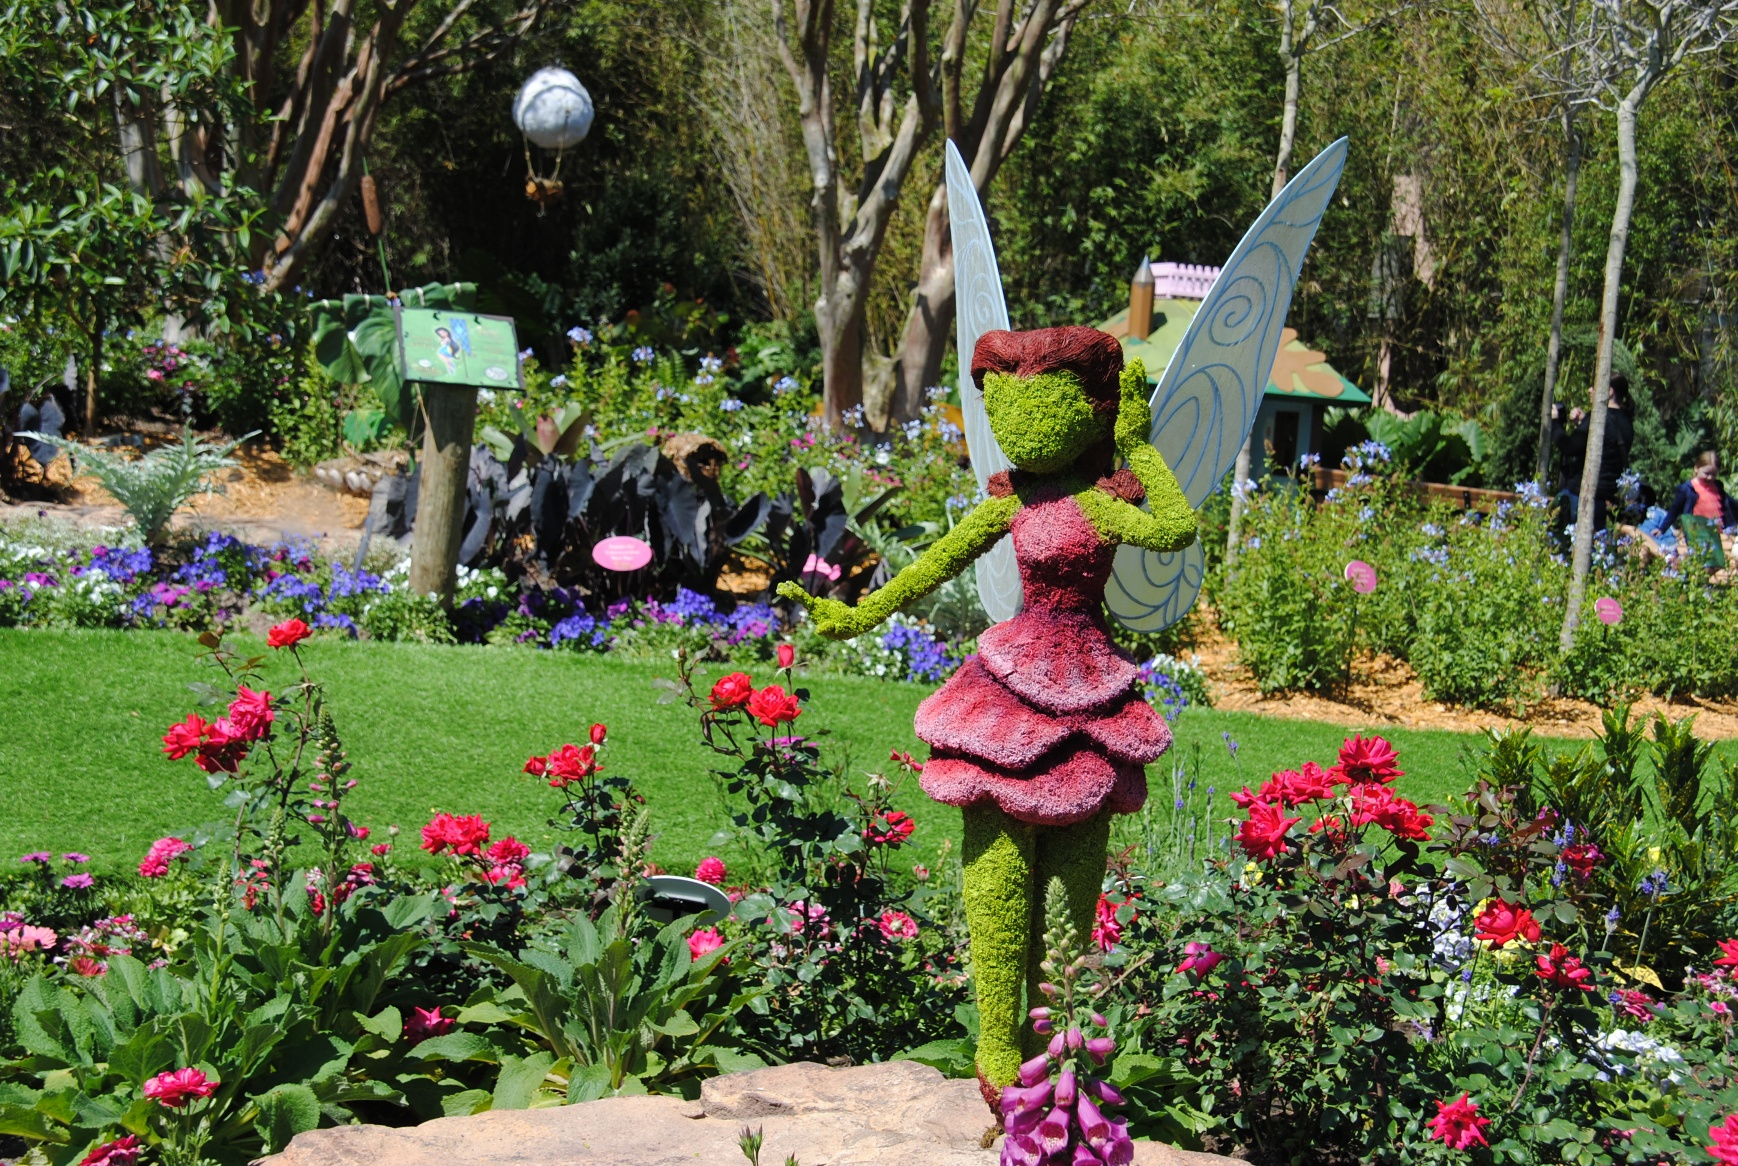 Here's Rosetta the Garden Fairy